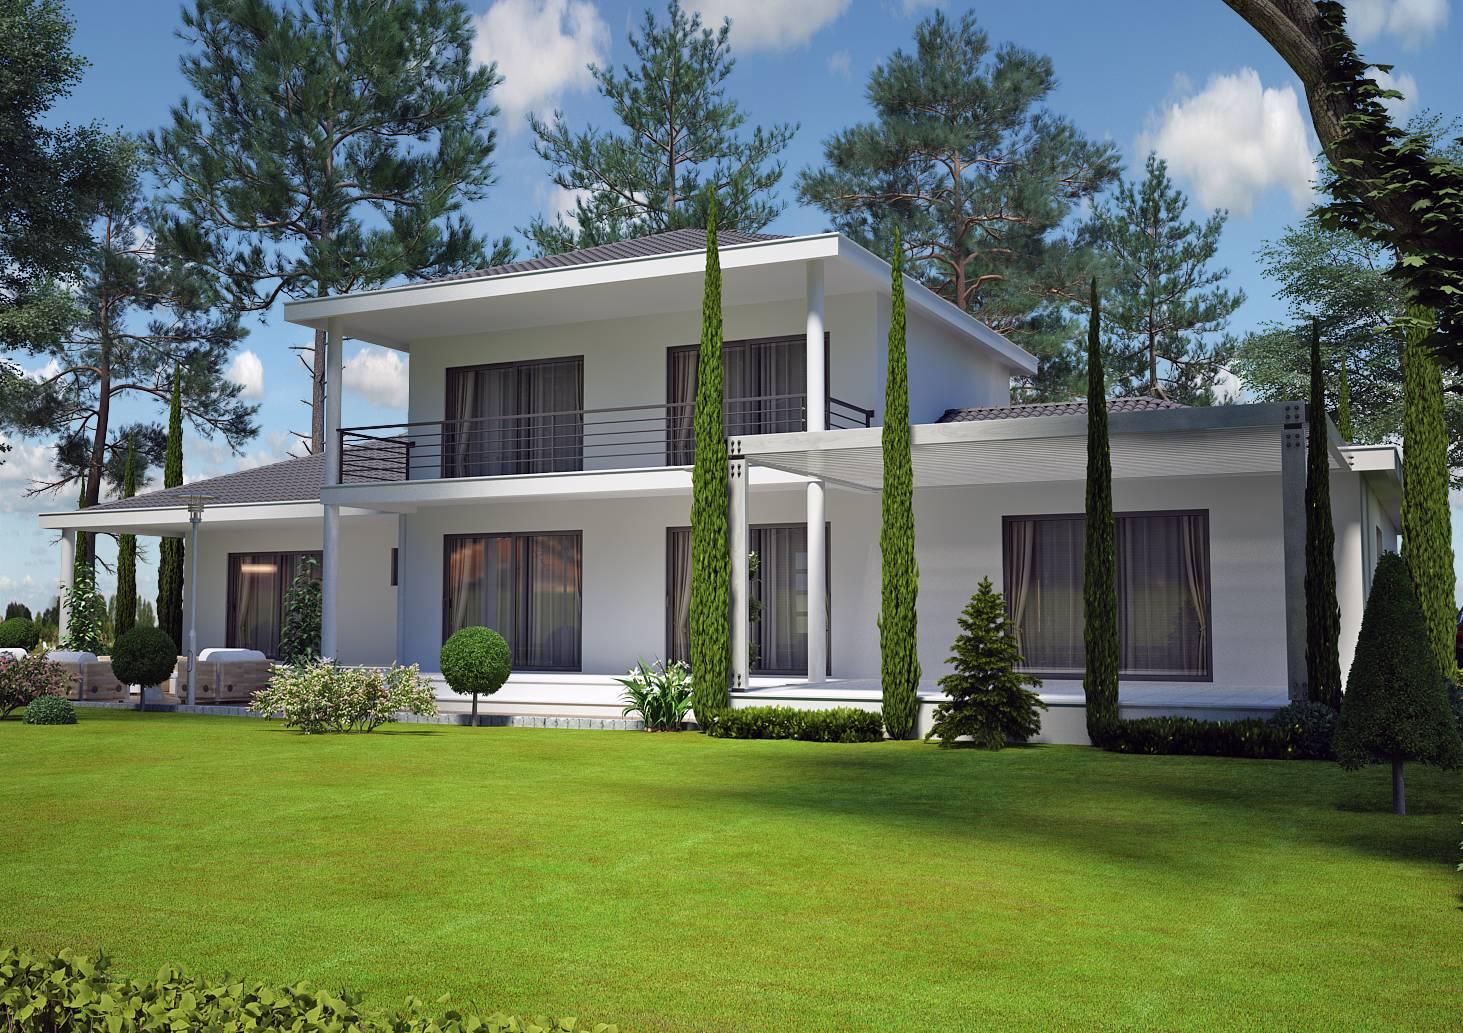 Modele maison moderne a etage maison fran ois fabie for Maison moderne 57